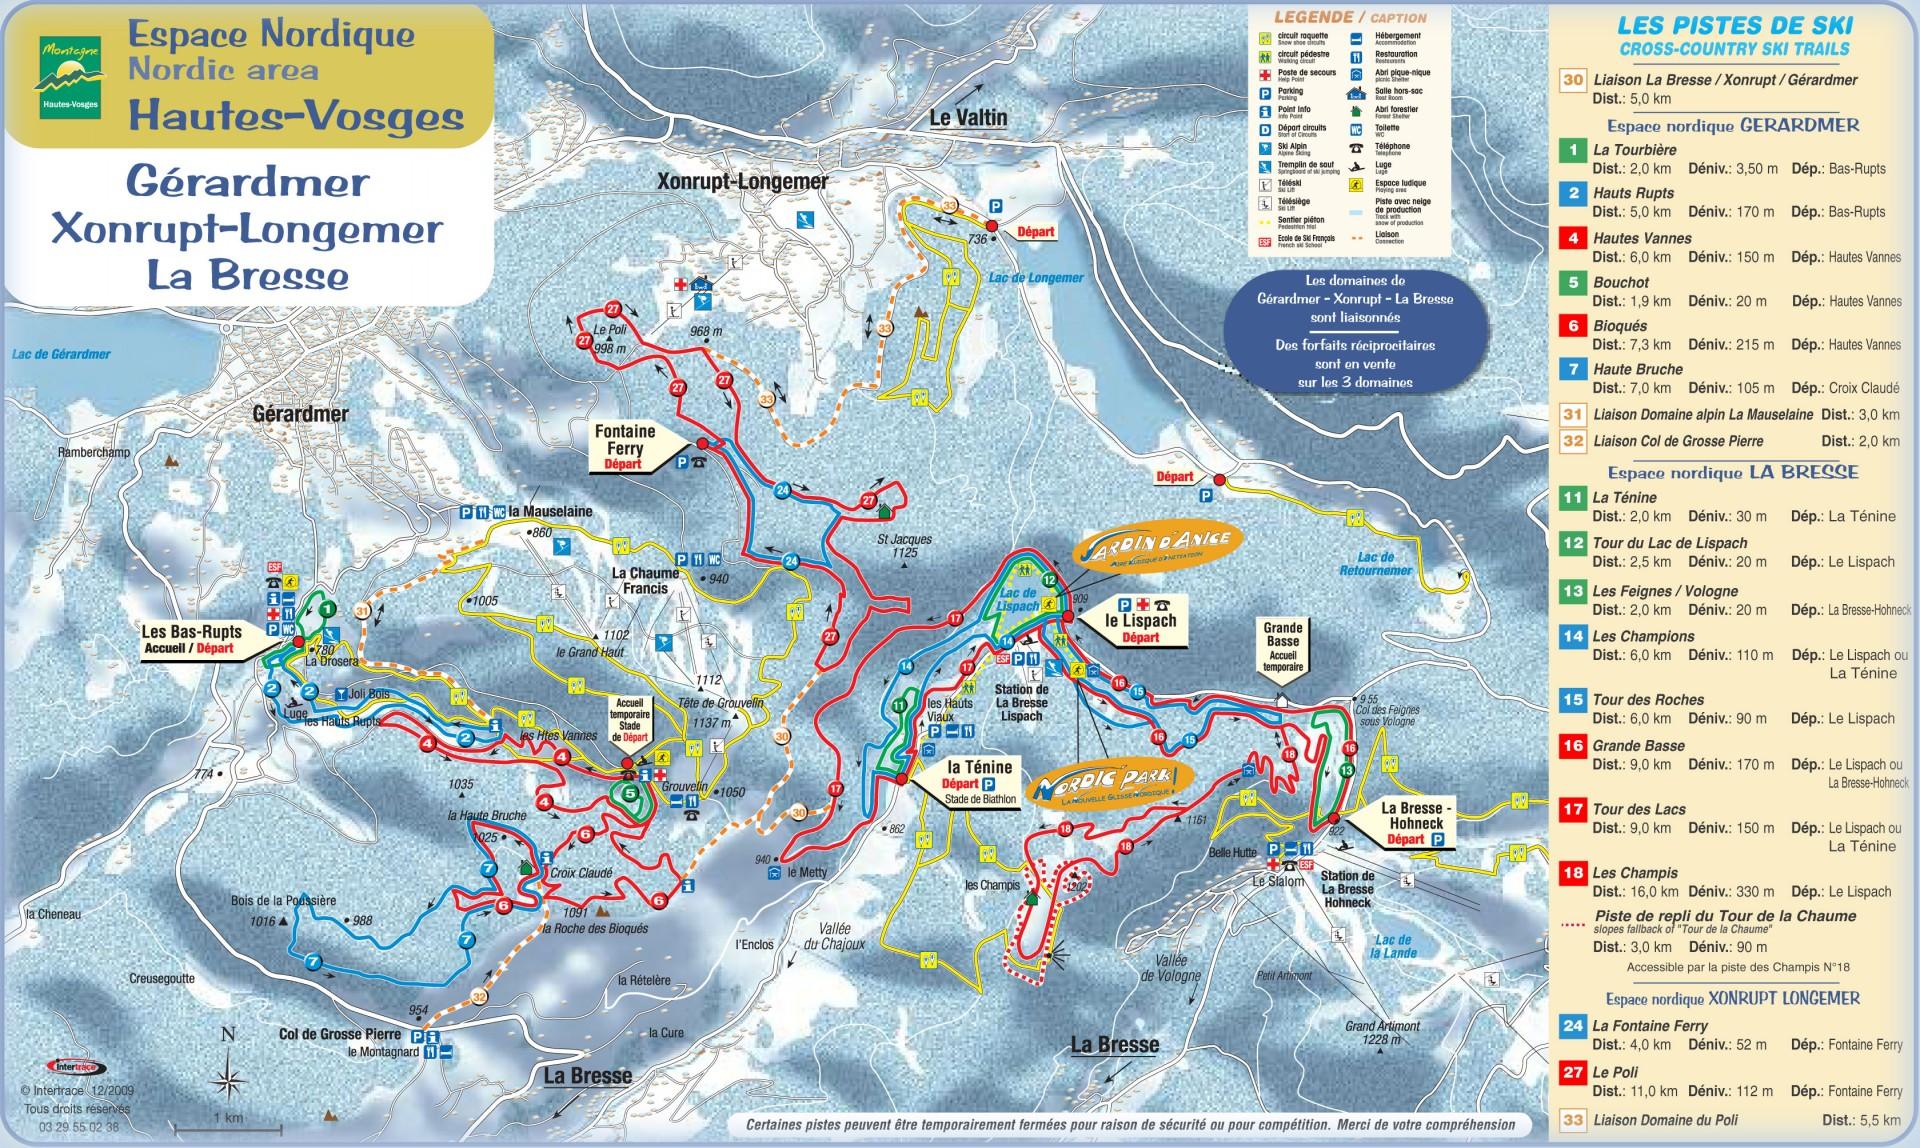 Trail map of Gérardmer, Xonrupt-Longemer and La Bresse